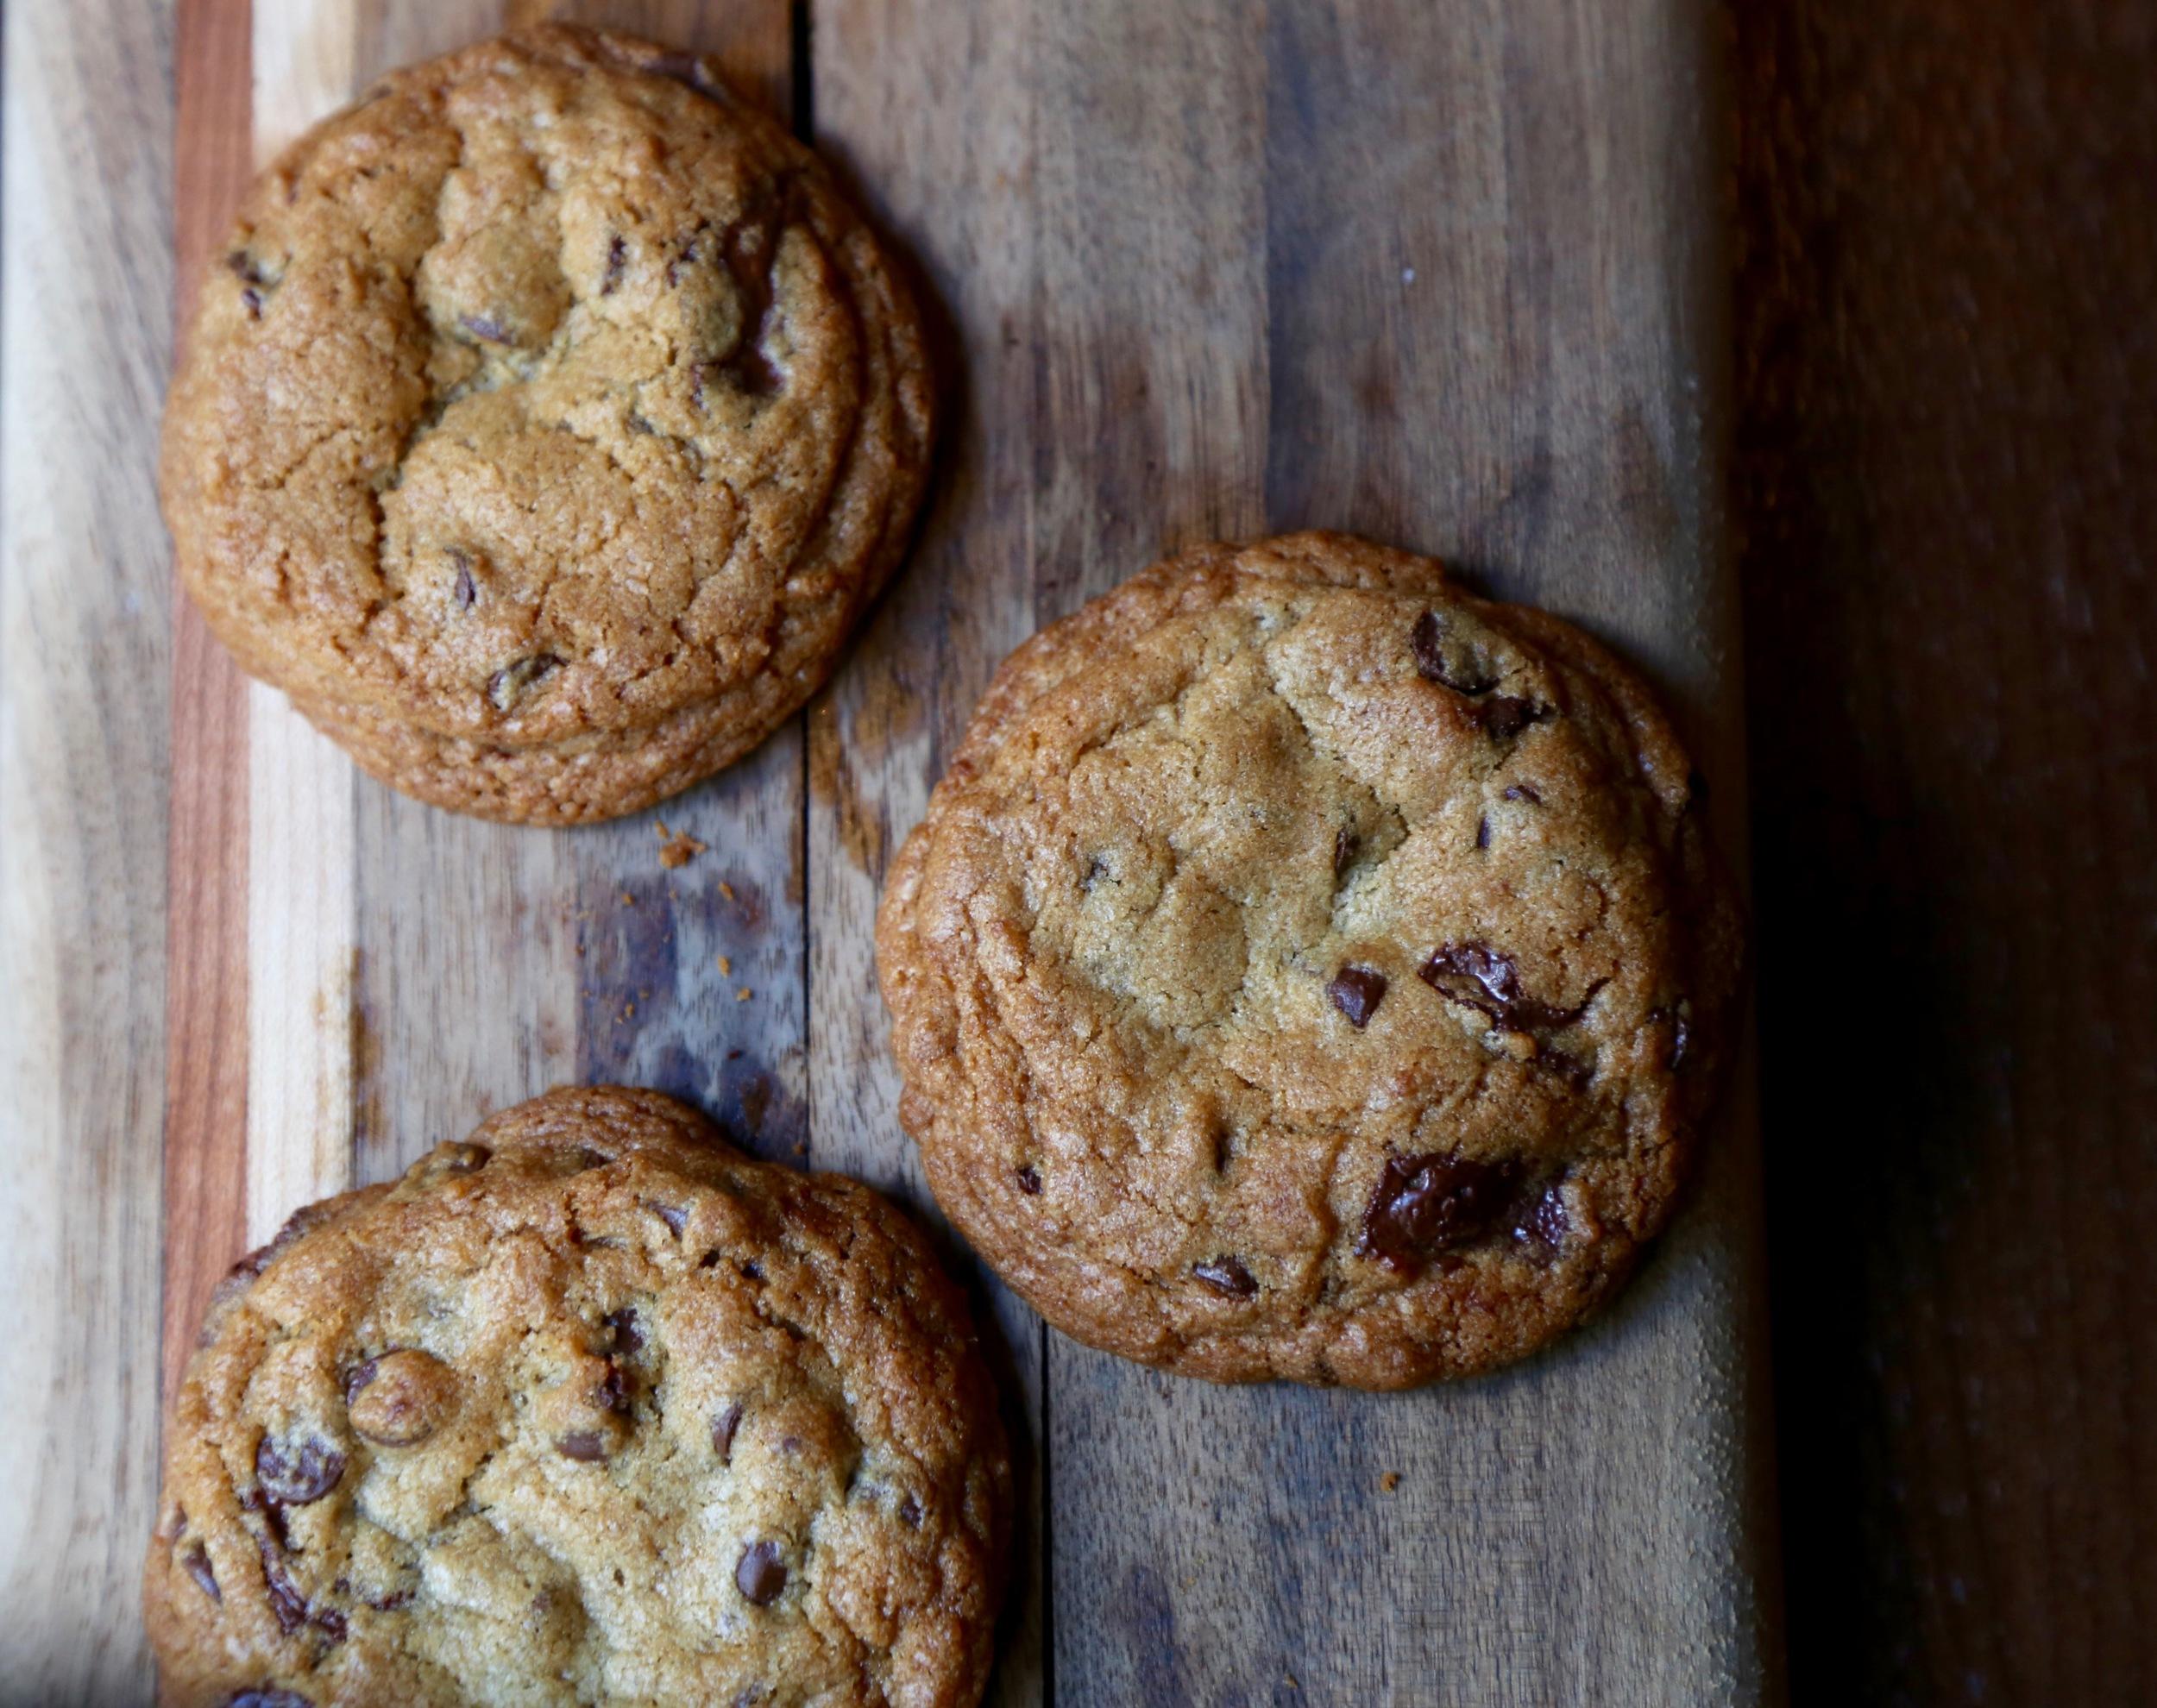 three chocolate chip cookies on wood table